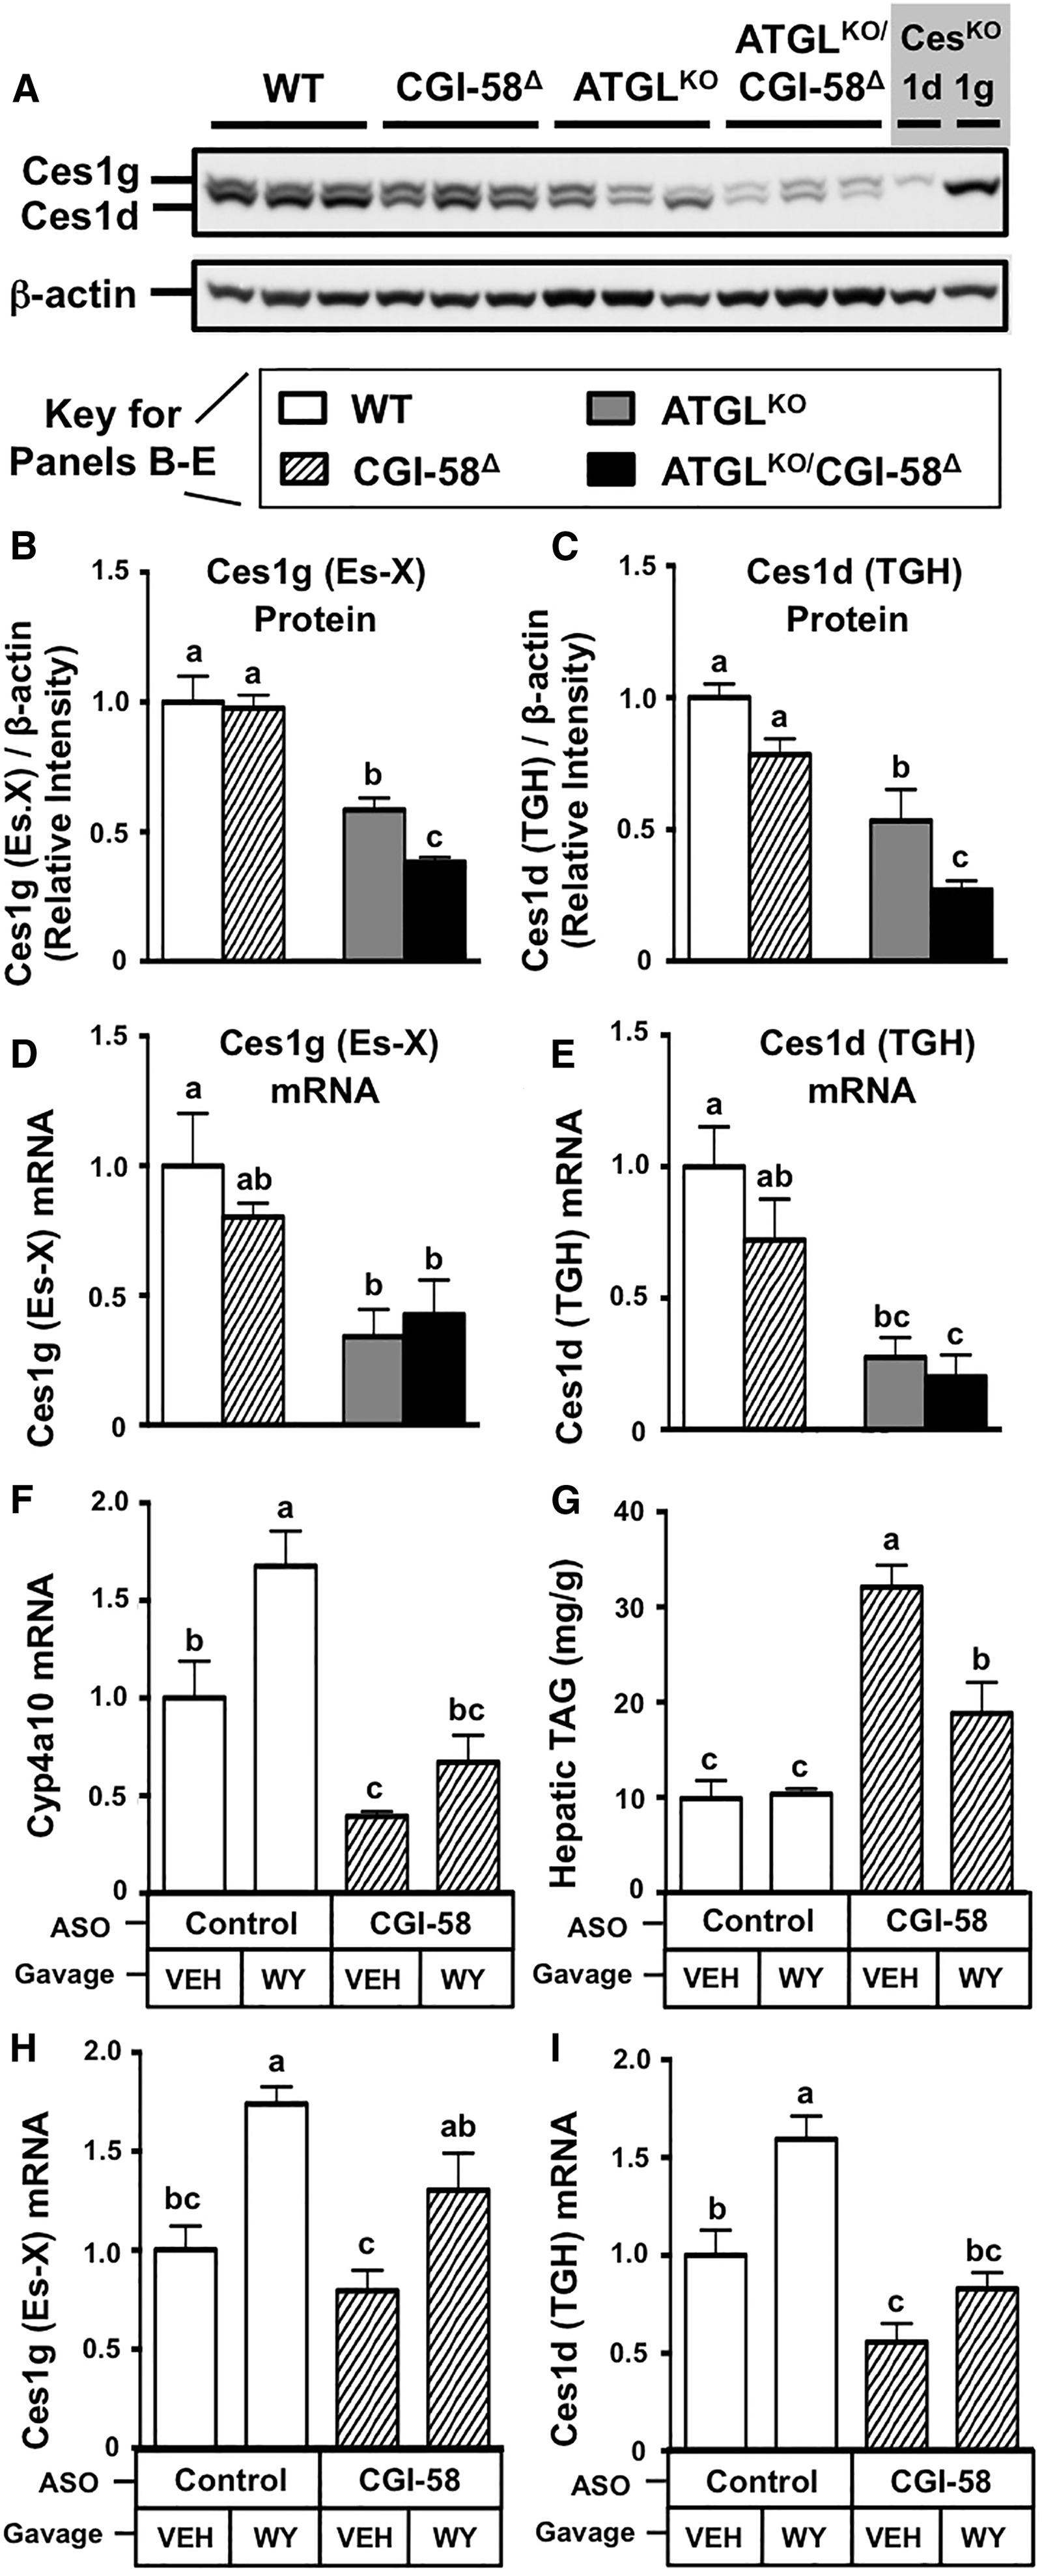 Regulation of Hepatic Triacylglycerol Metabolism by CGI-58